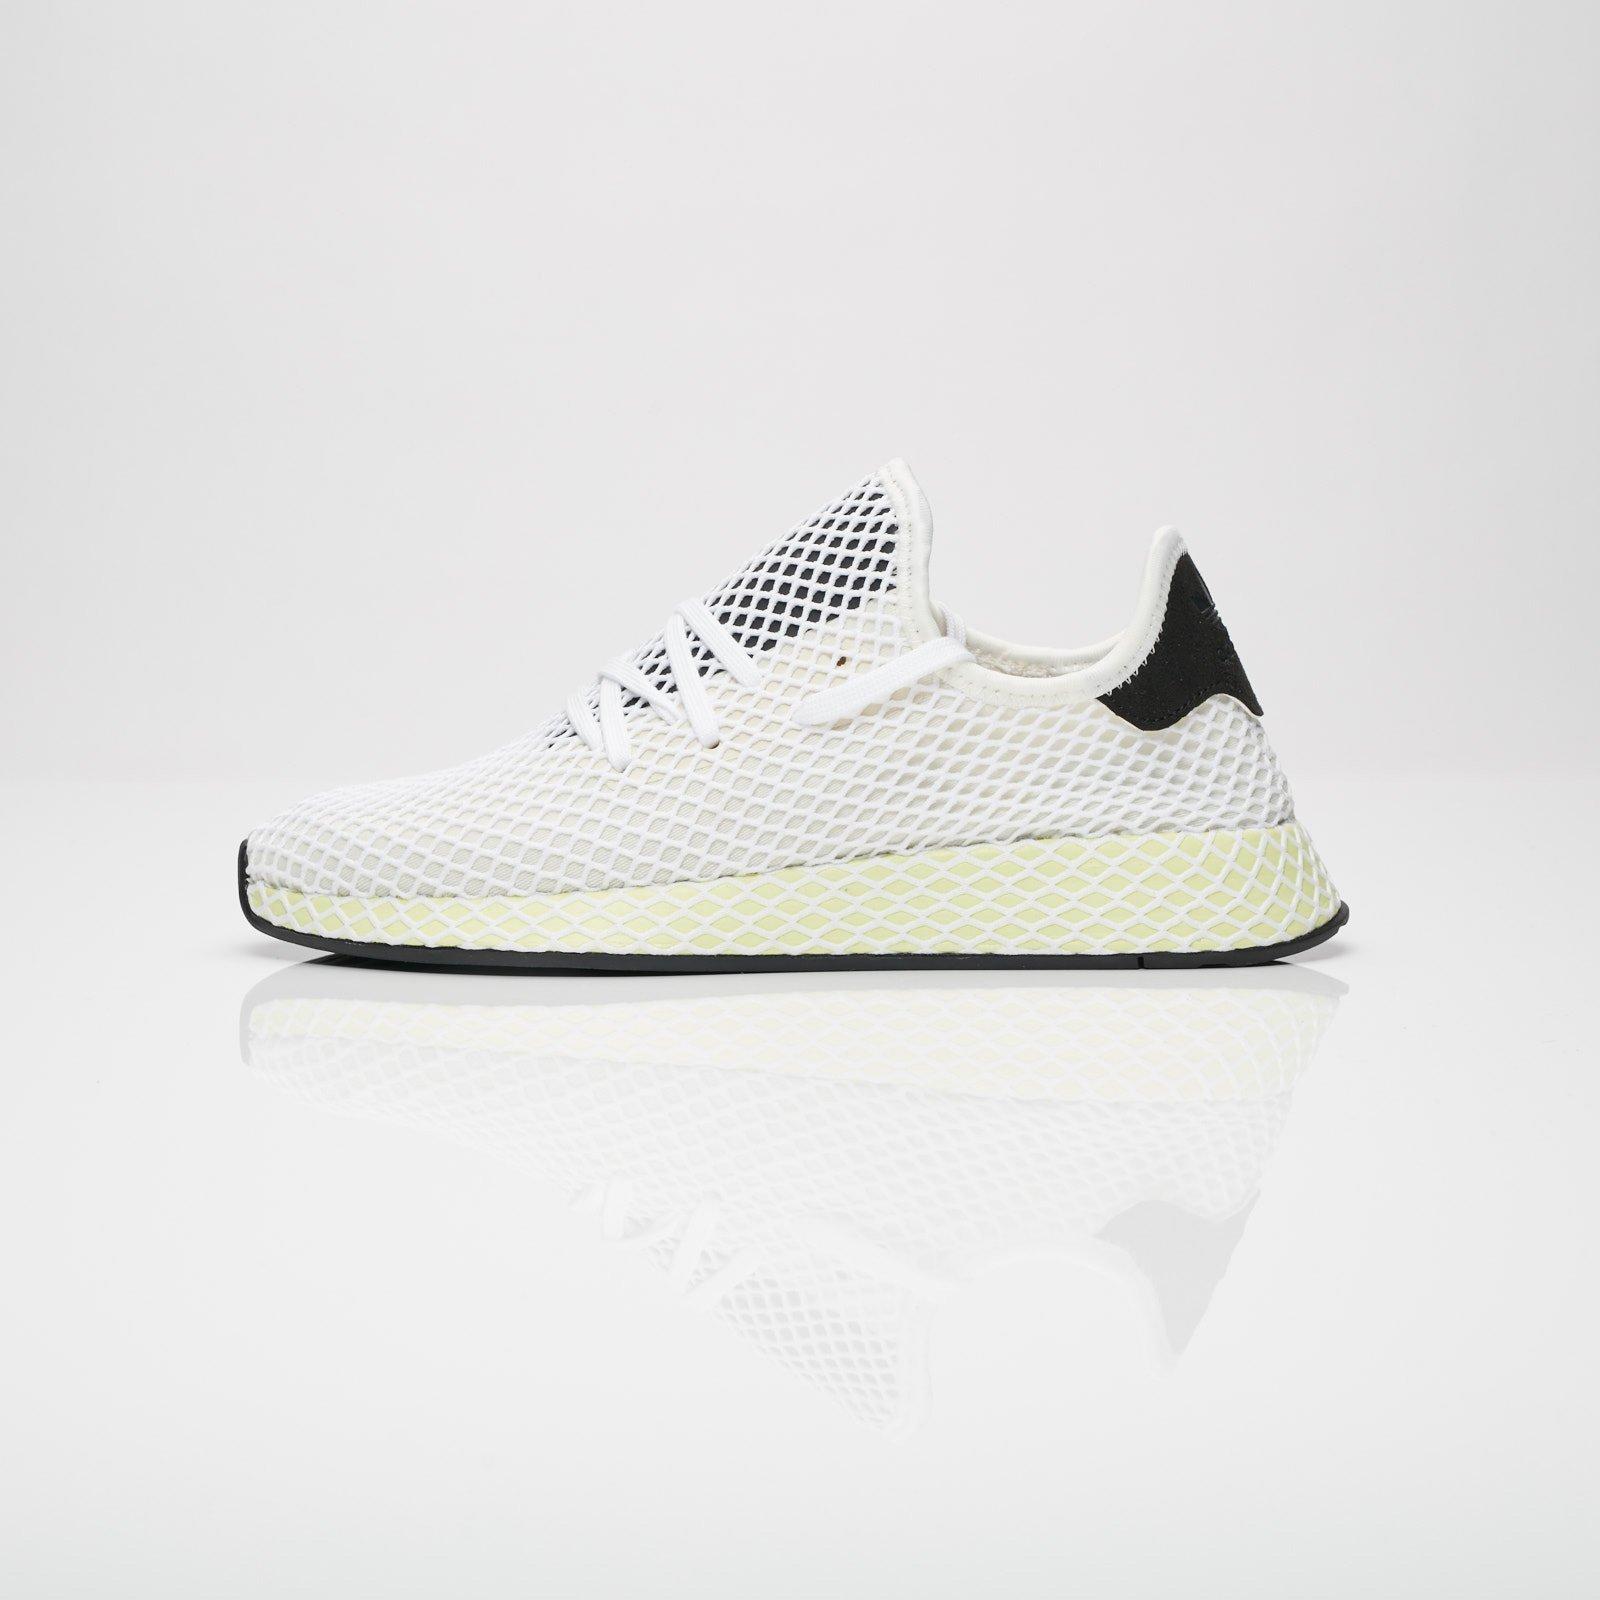 premium selection 4fcd8 57009 adidas Originals Deerupt Runner adidas Originals Deerupt Runner ...